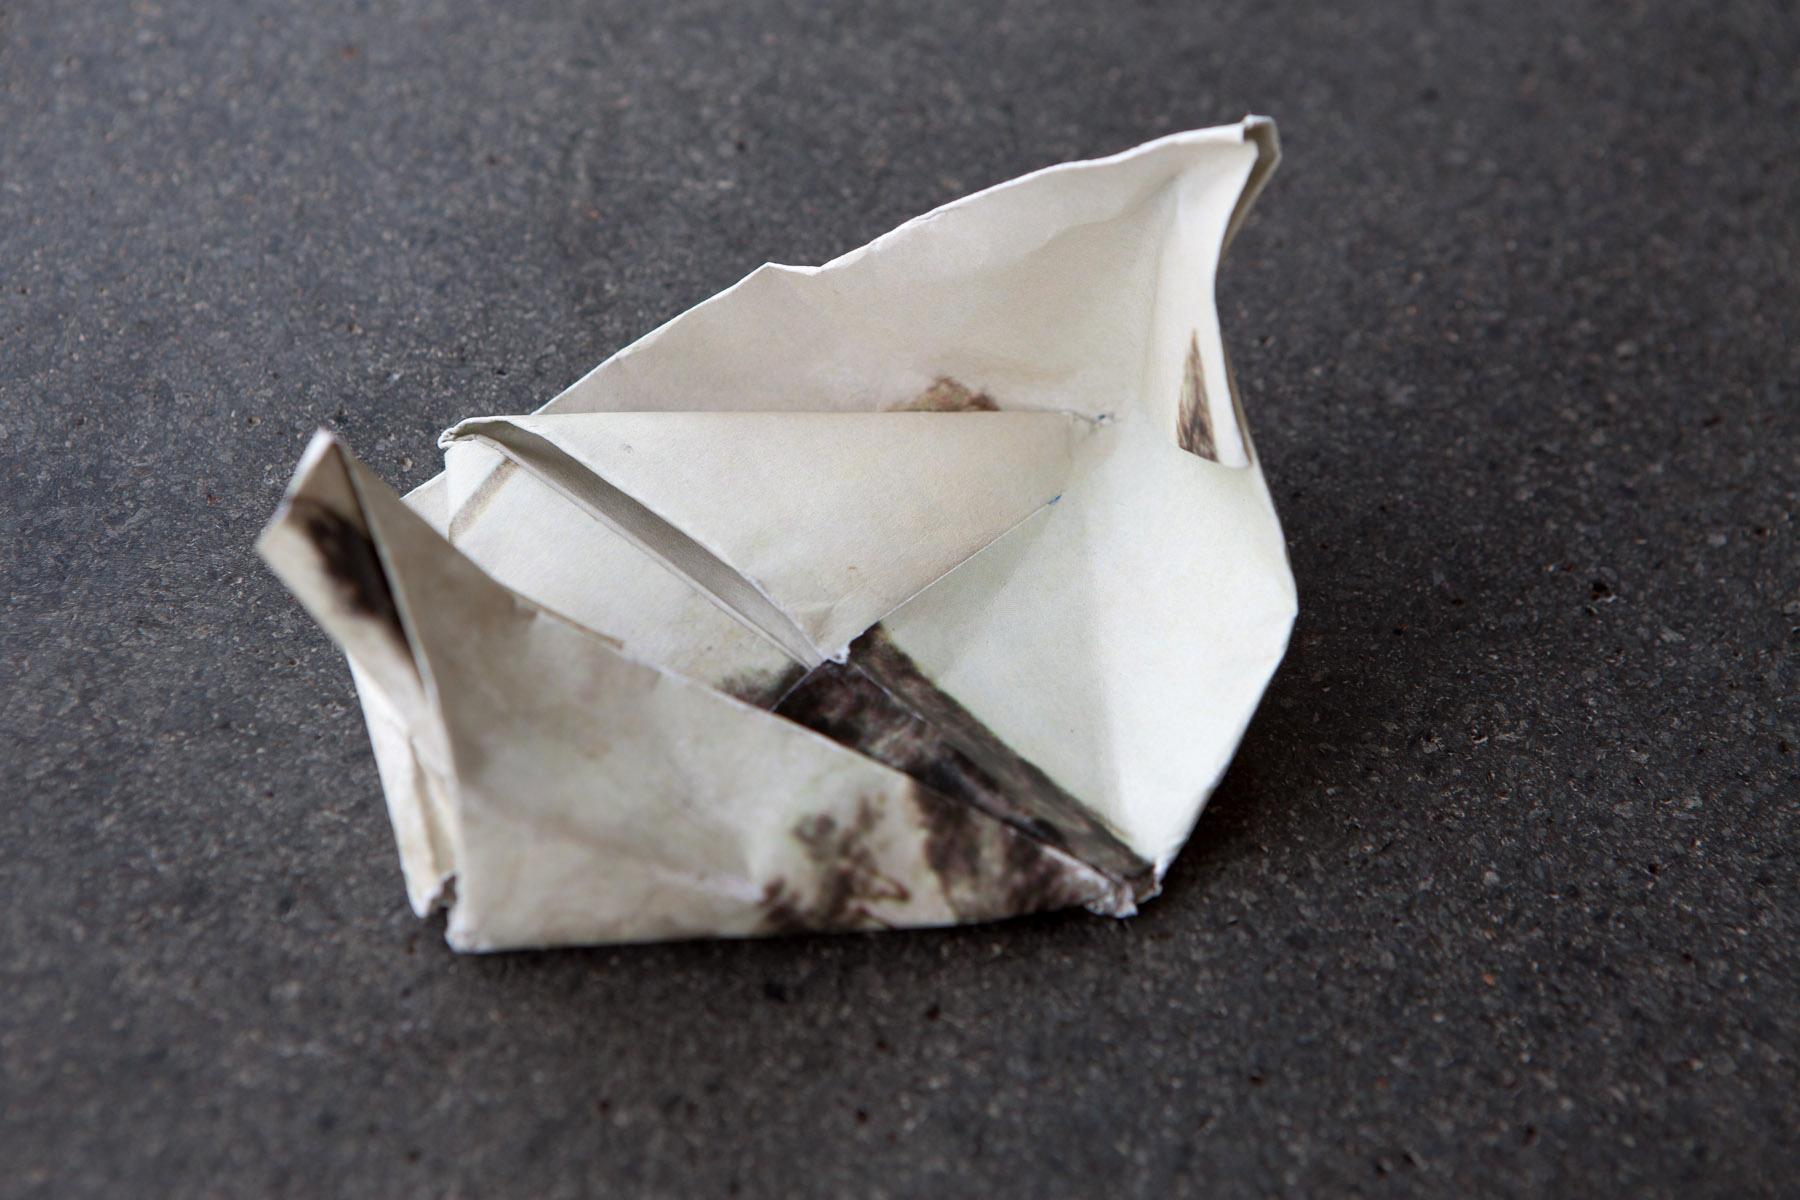 201405_PaperBoats_16.jpg